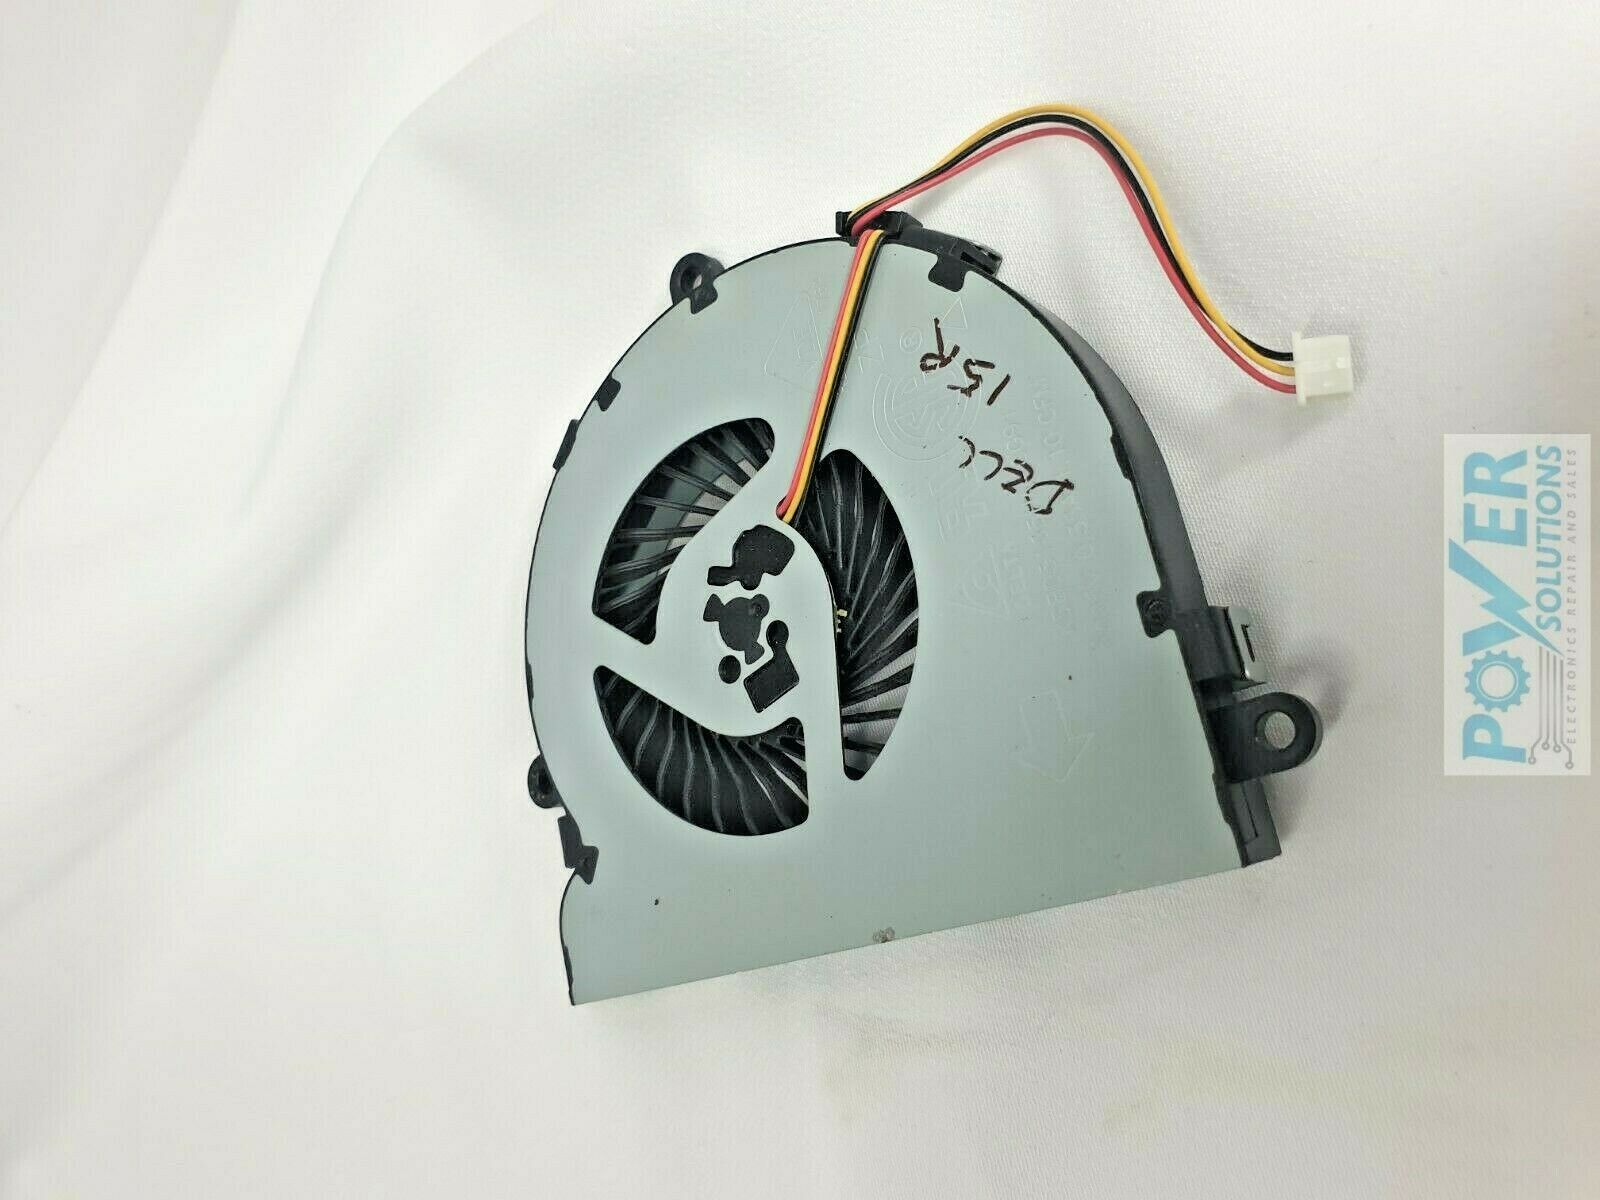 DELL INSPIRON 15R 5537 CPU COOLER FAN GENUINE PARTS 133378240546